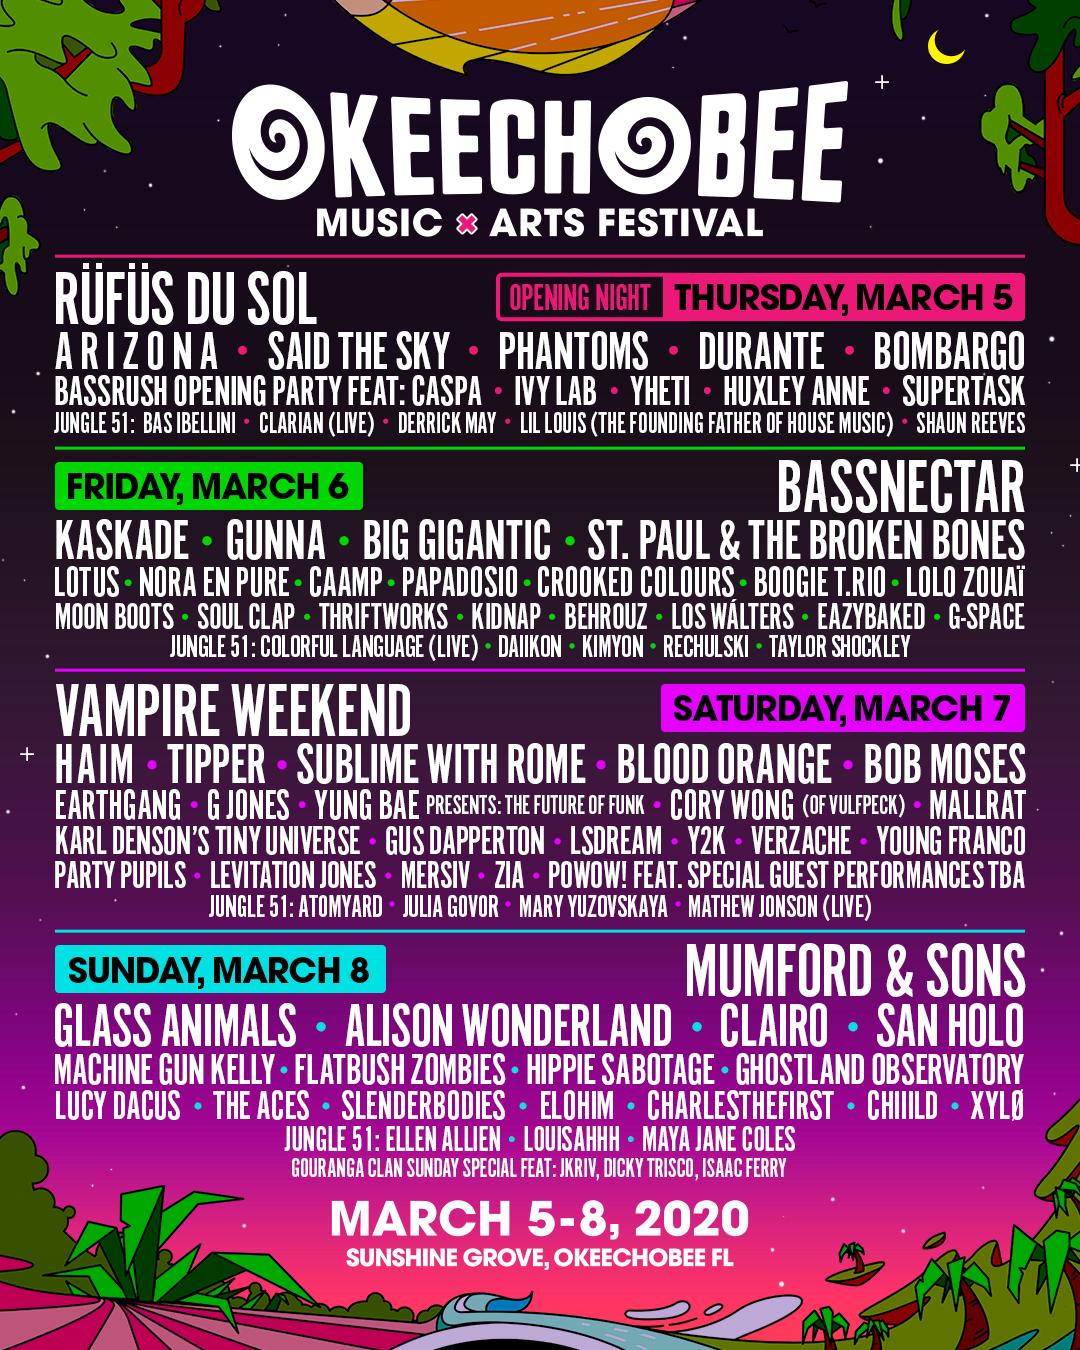 Okeechobee Music Festival 2020 Lineup.Lineup Okeechobee Festival